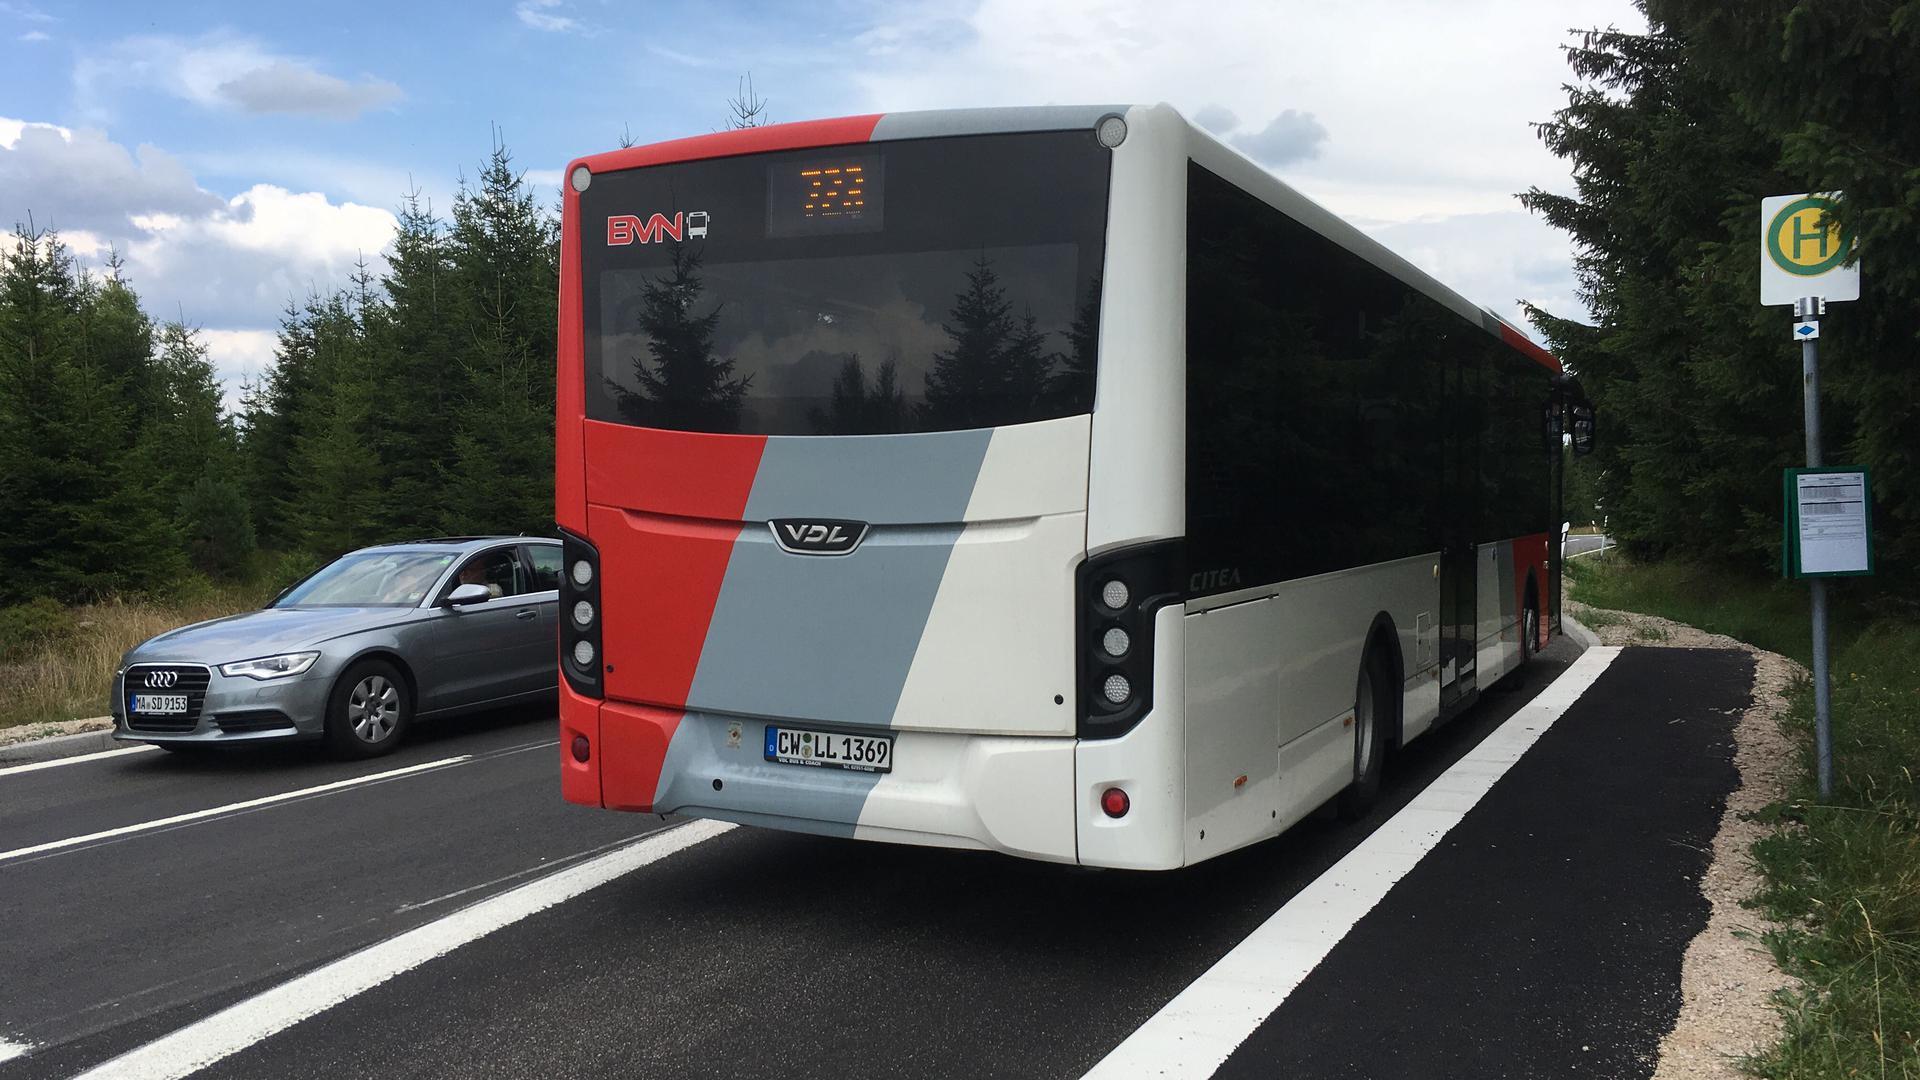 Nahverkehr Personennahverkehr Bus Buslinie  Kaltenbronn Haltestelle Schwarzmiss ÖPNV öffentlicher AVG KVV